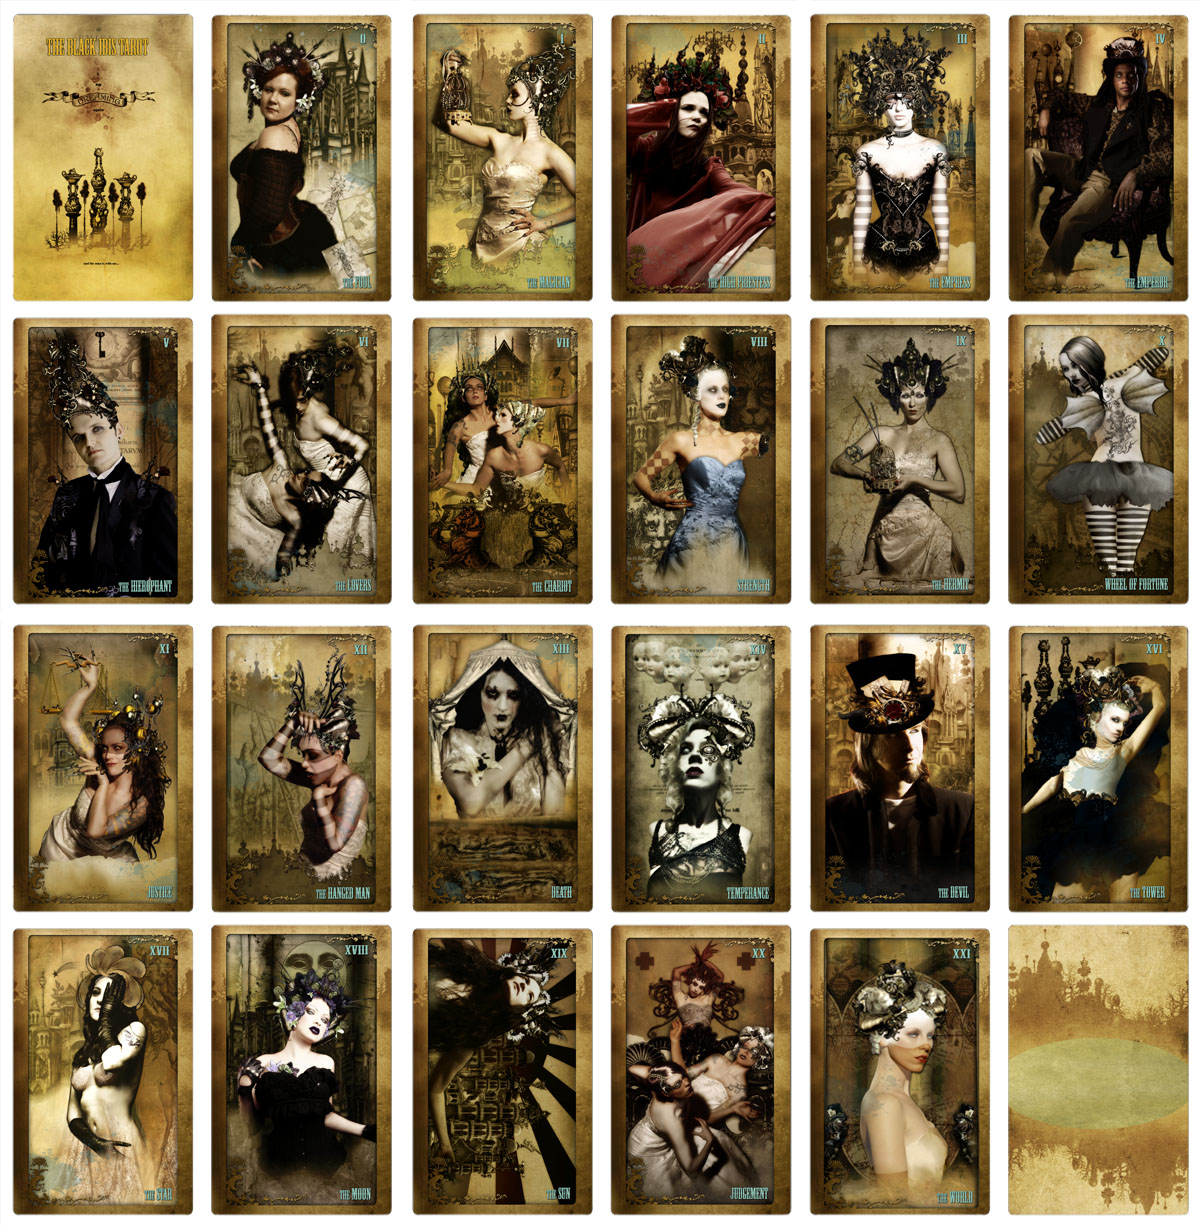 Attic Cartomancy - The Black Ibis Tarot - Third Edition